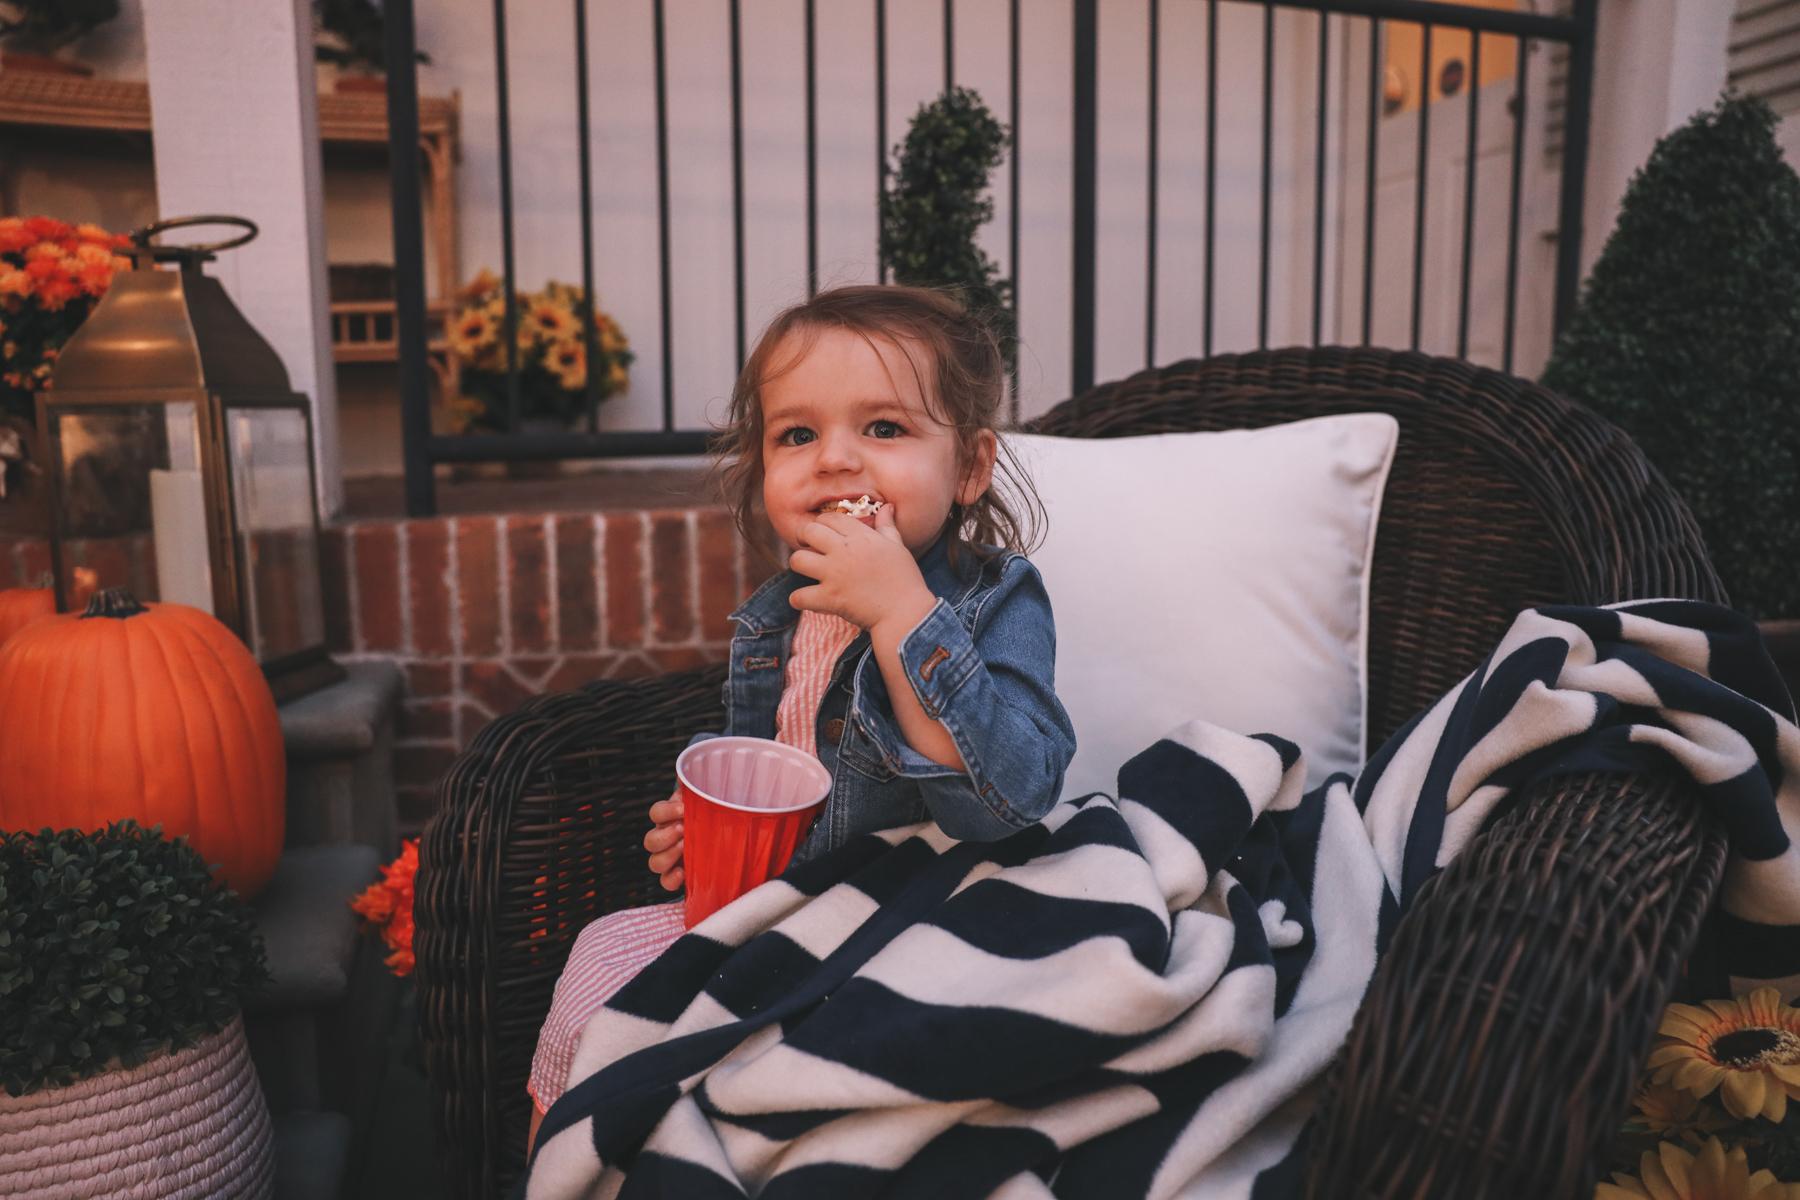 Lucy enjoying some popcorn